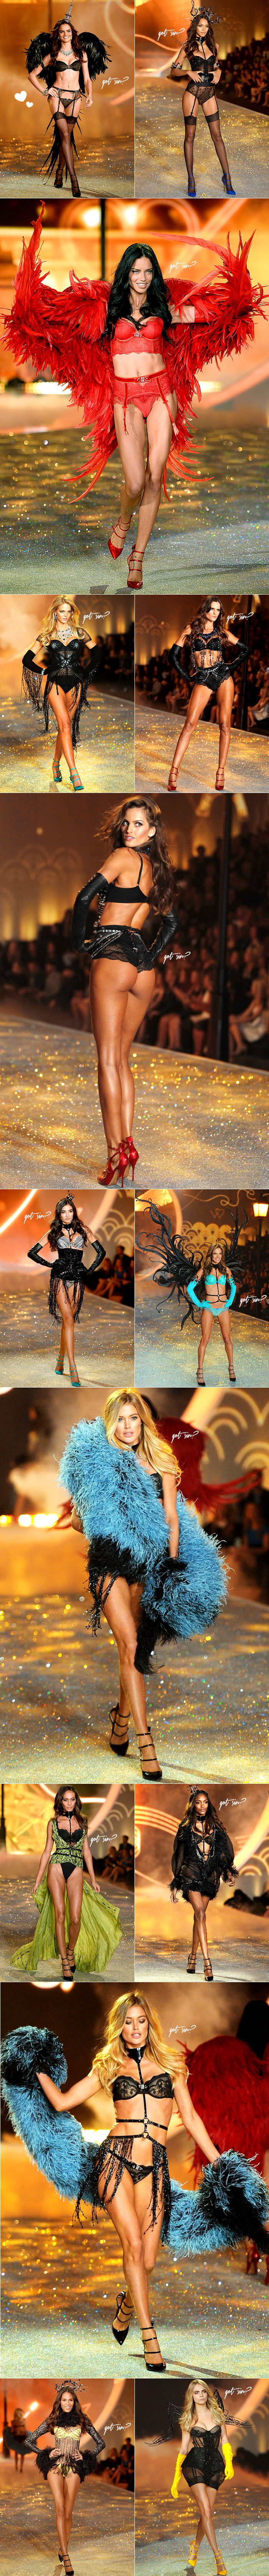 desfile-victorias-secret-fashion-show-blog-got-sin-alessandra-ambrosio-doutzen-kroes-candice-swanepoel-sexy-lingerie-03